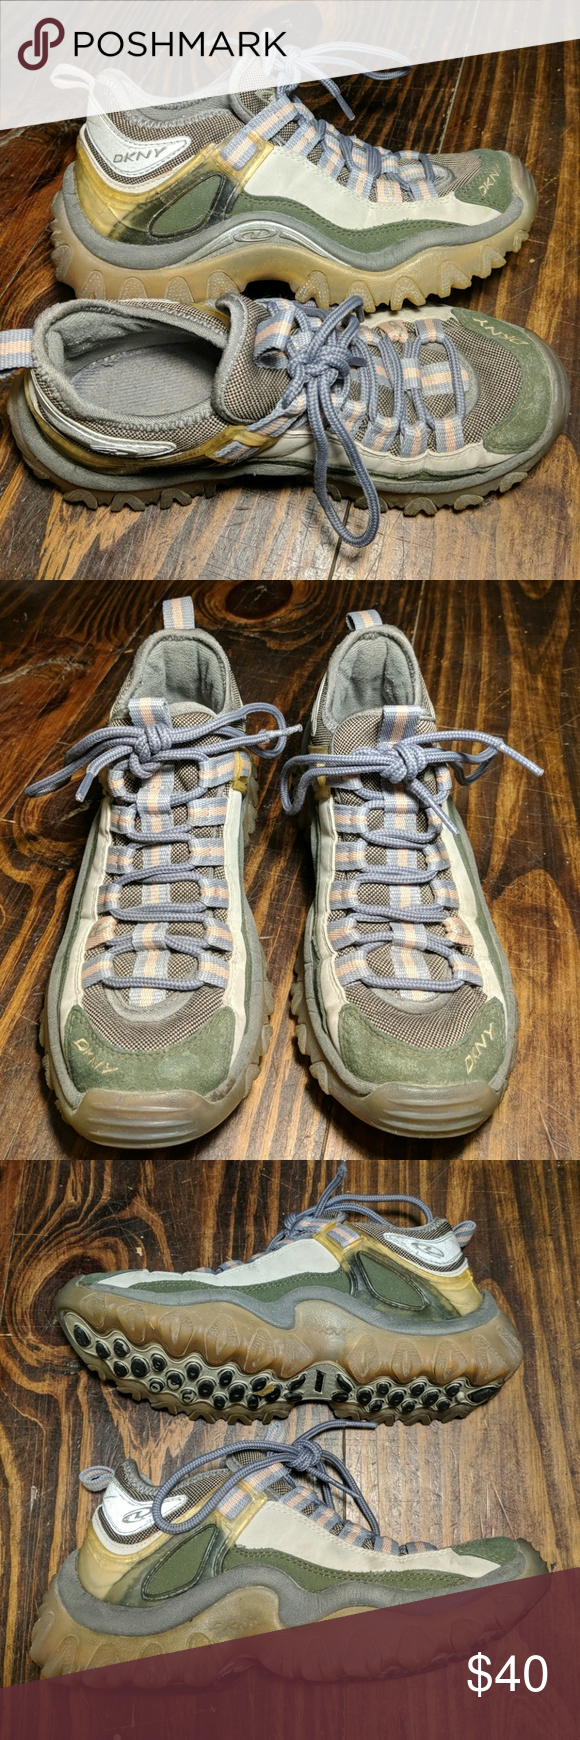 DKNY Rare Hybrid Hiking Shoes | Hiking